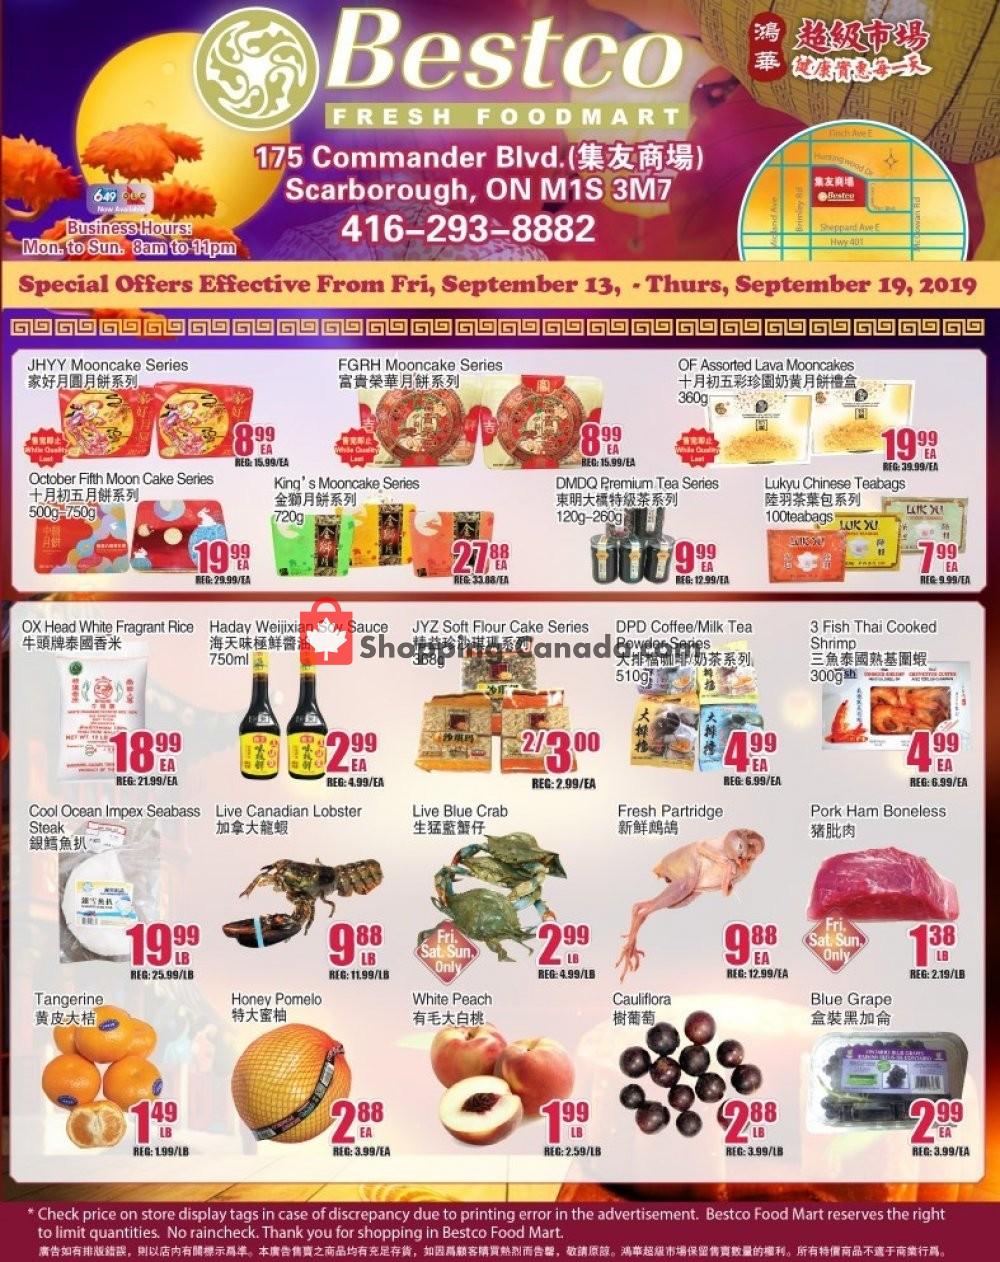 Flyer Bestco Food Mart Canada - from Friday September 13, 2019 to Thursday September 19, 2019